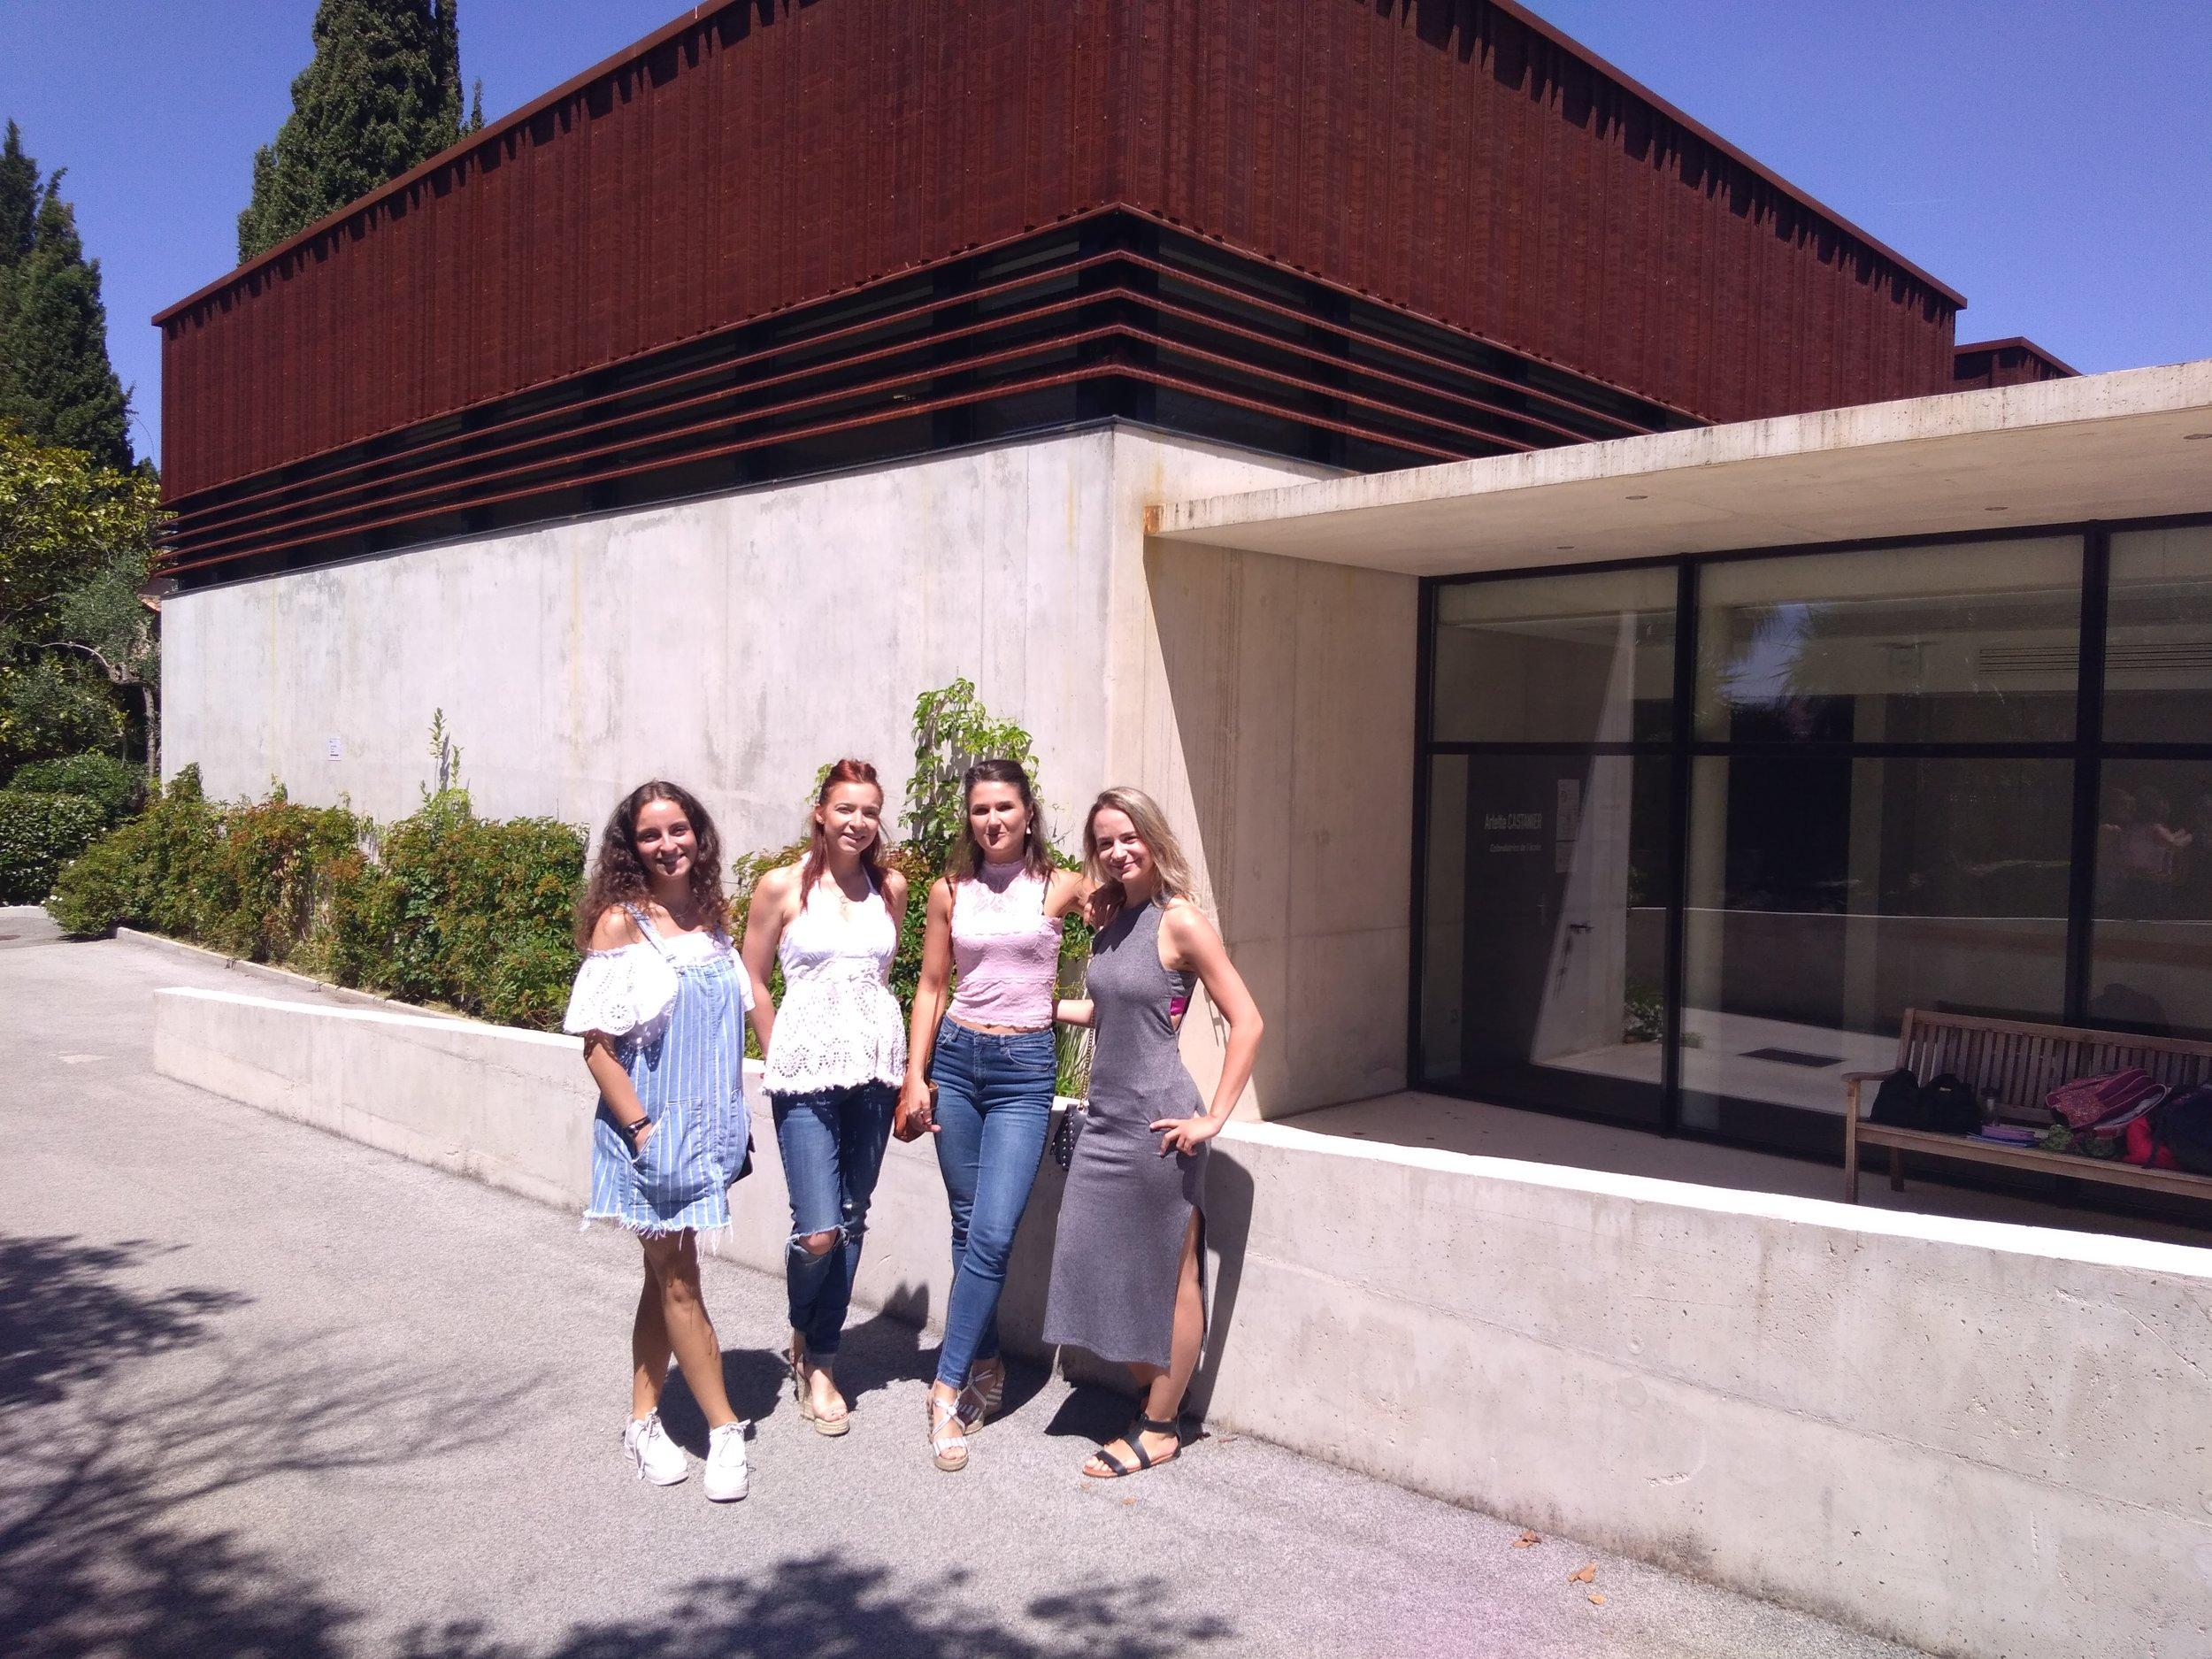 Les étudiantes : Pénélope Lo Iacono, Lauryanne Cizel, Mélina Raynaud & Johanne Dumas